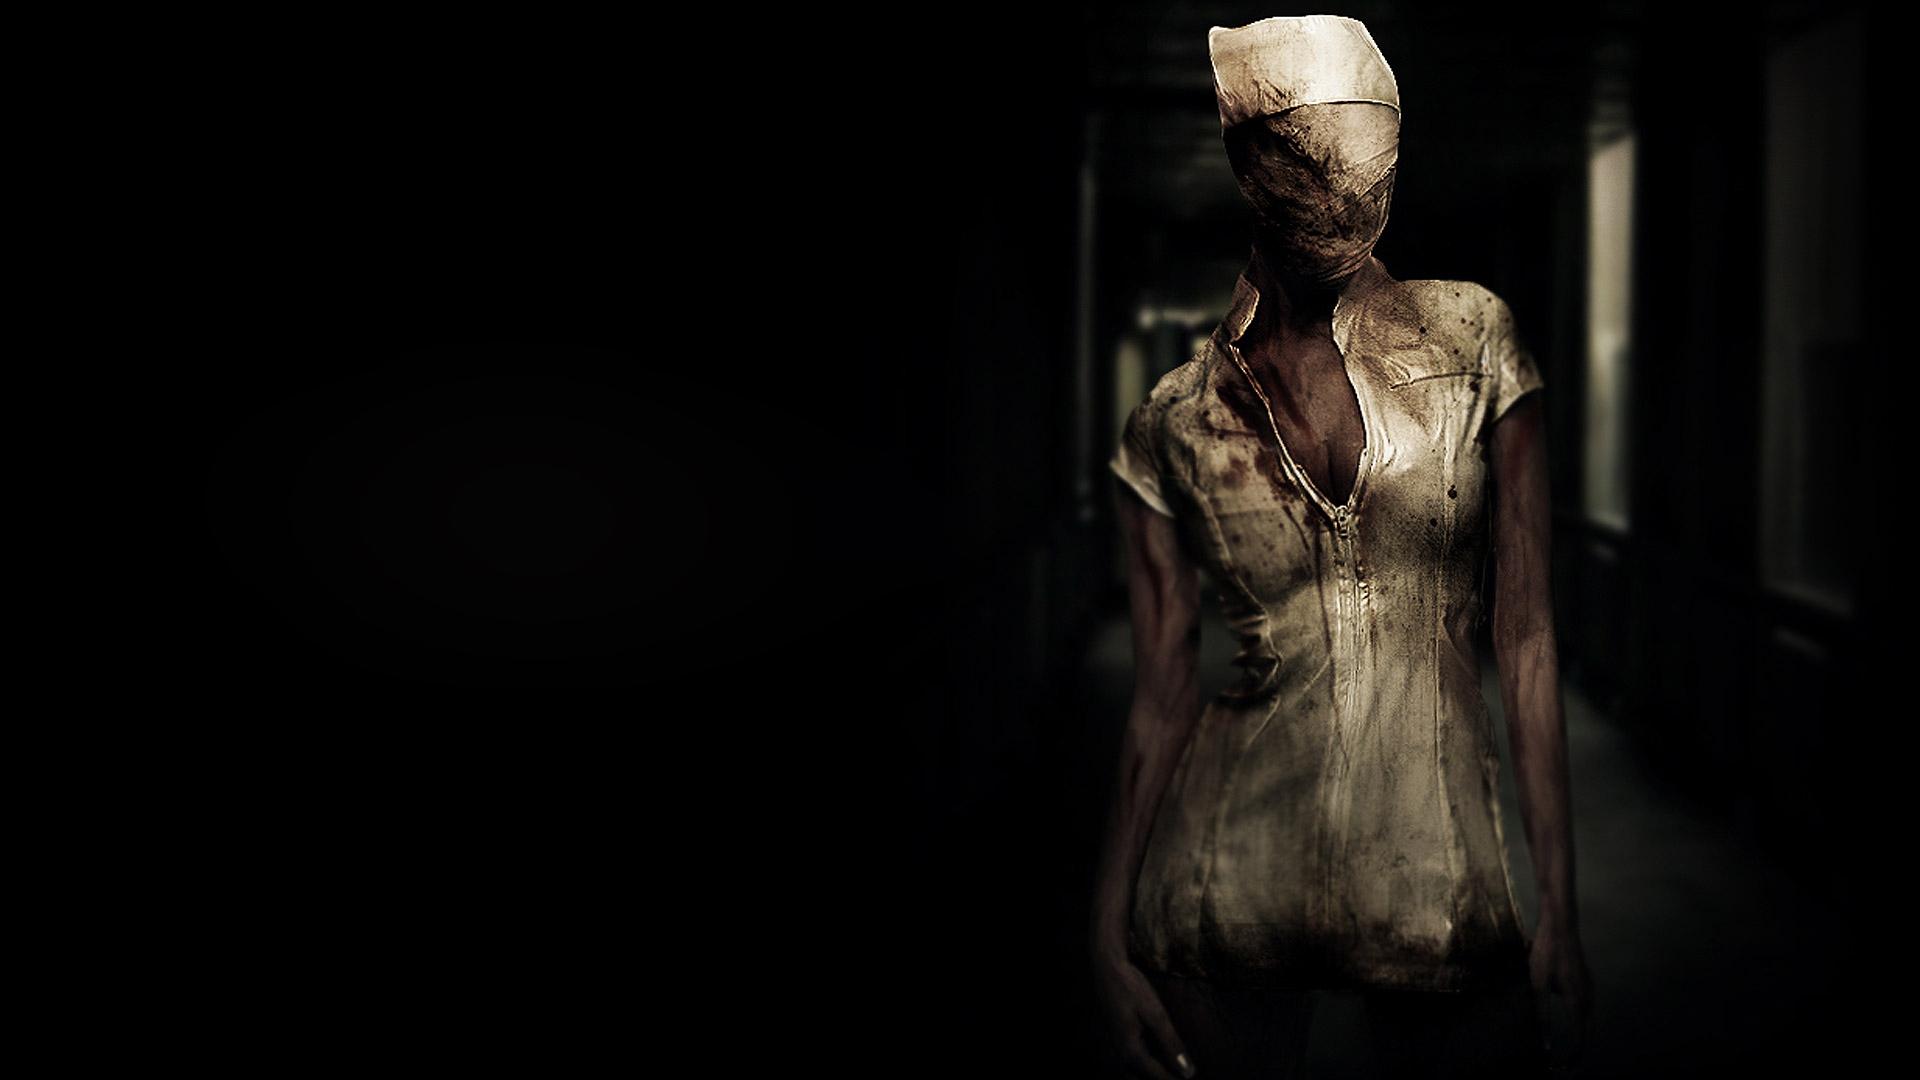 Hd wallpaper horror - Horror Zombie Wallpaper Full Hd 4 Jpg Wallconvert